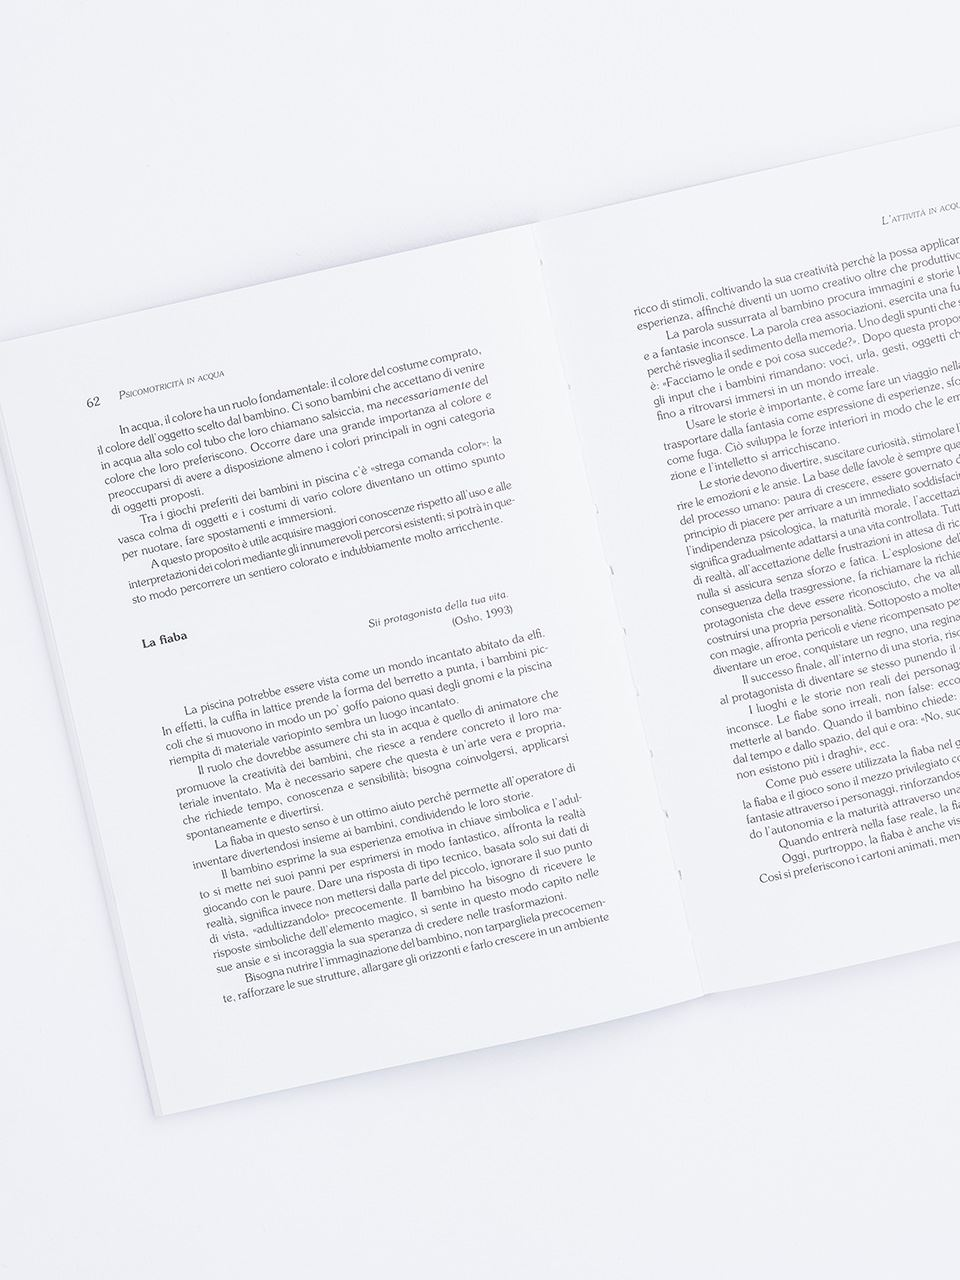 Psicomotricità in acqua - Libri - Erickson 2